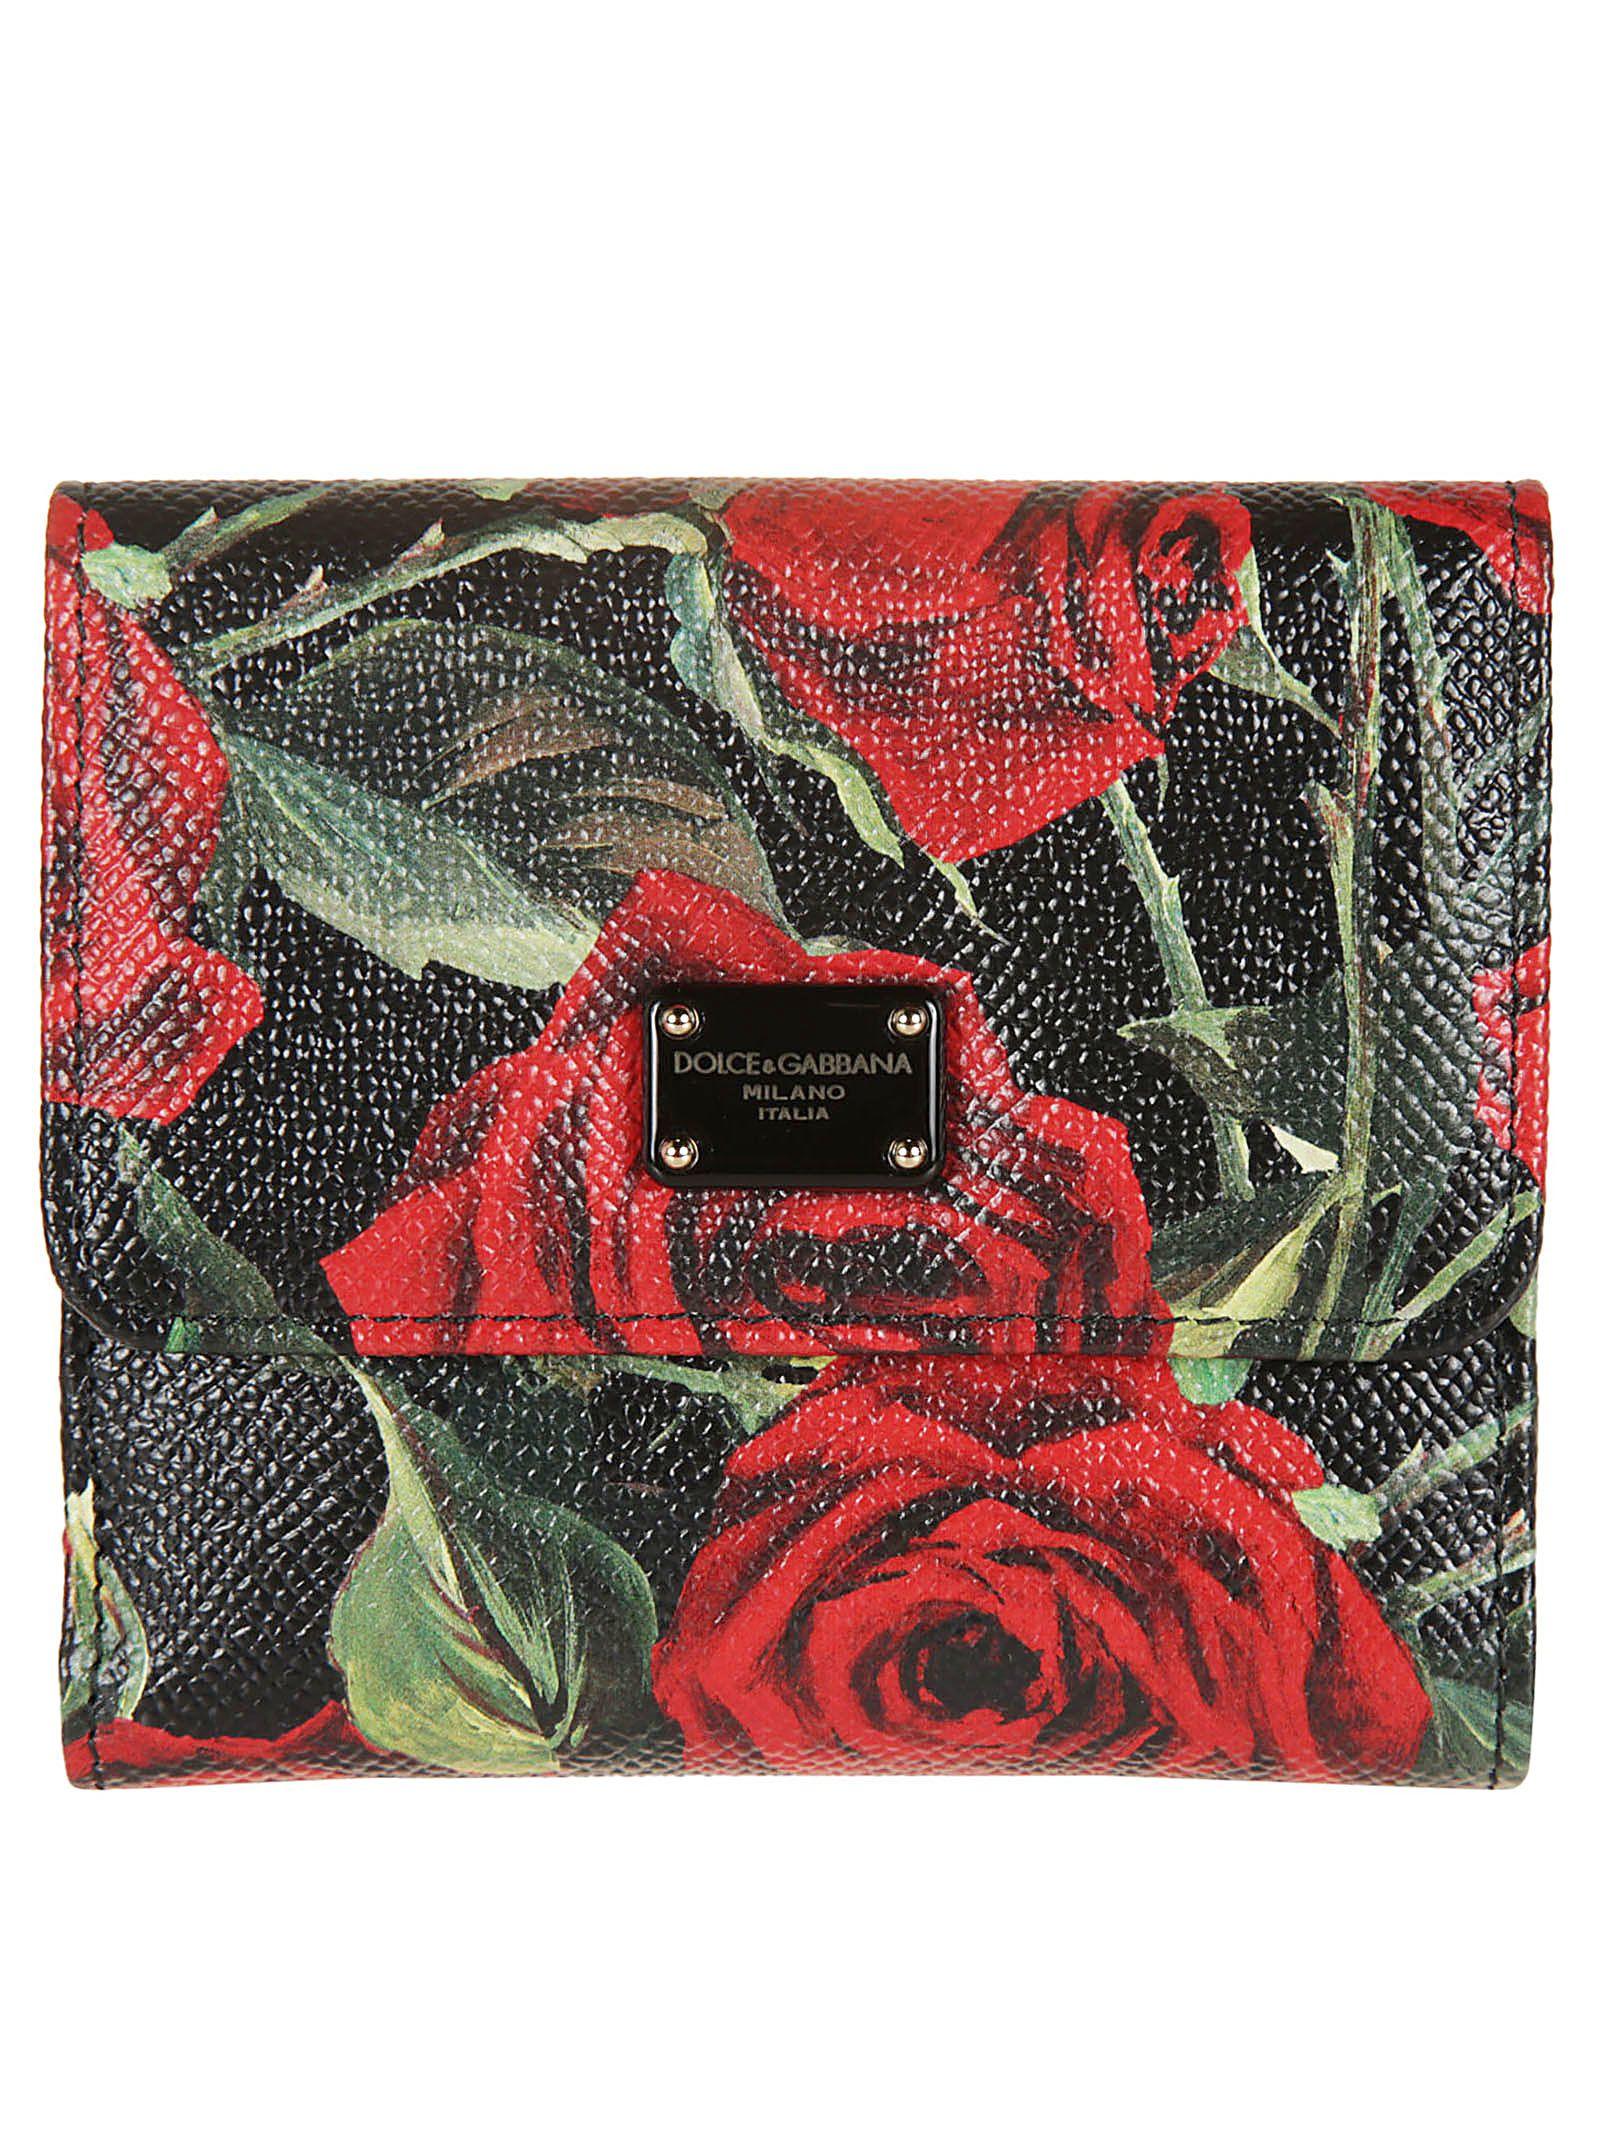 Dolce & Gabbana Floral Print Logo Plaque Wallet